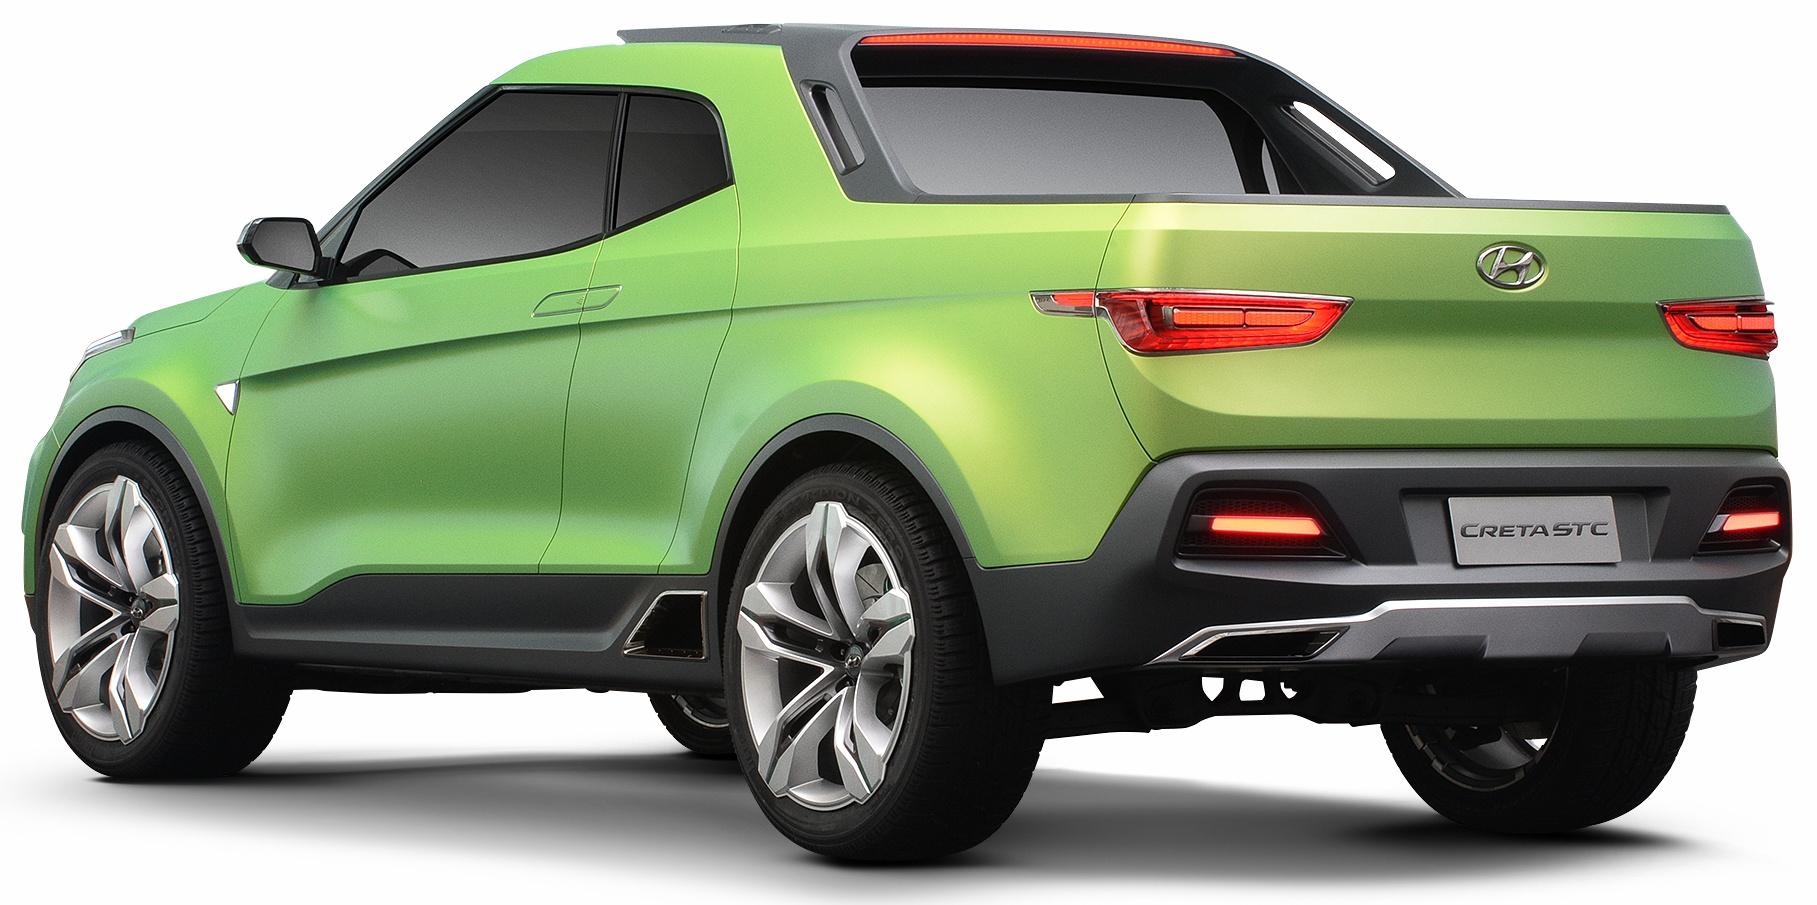 Hyundai Creta Stc Pick Up Concept Unveiled In Brazil Image